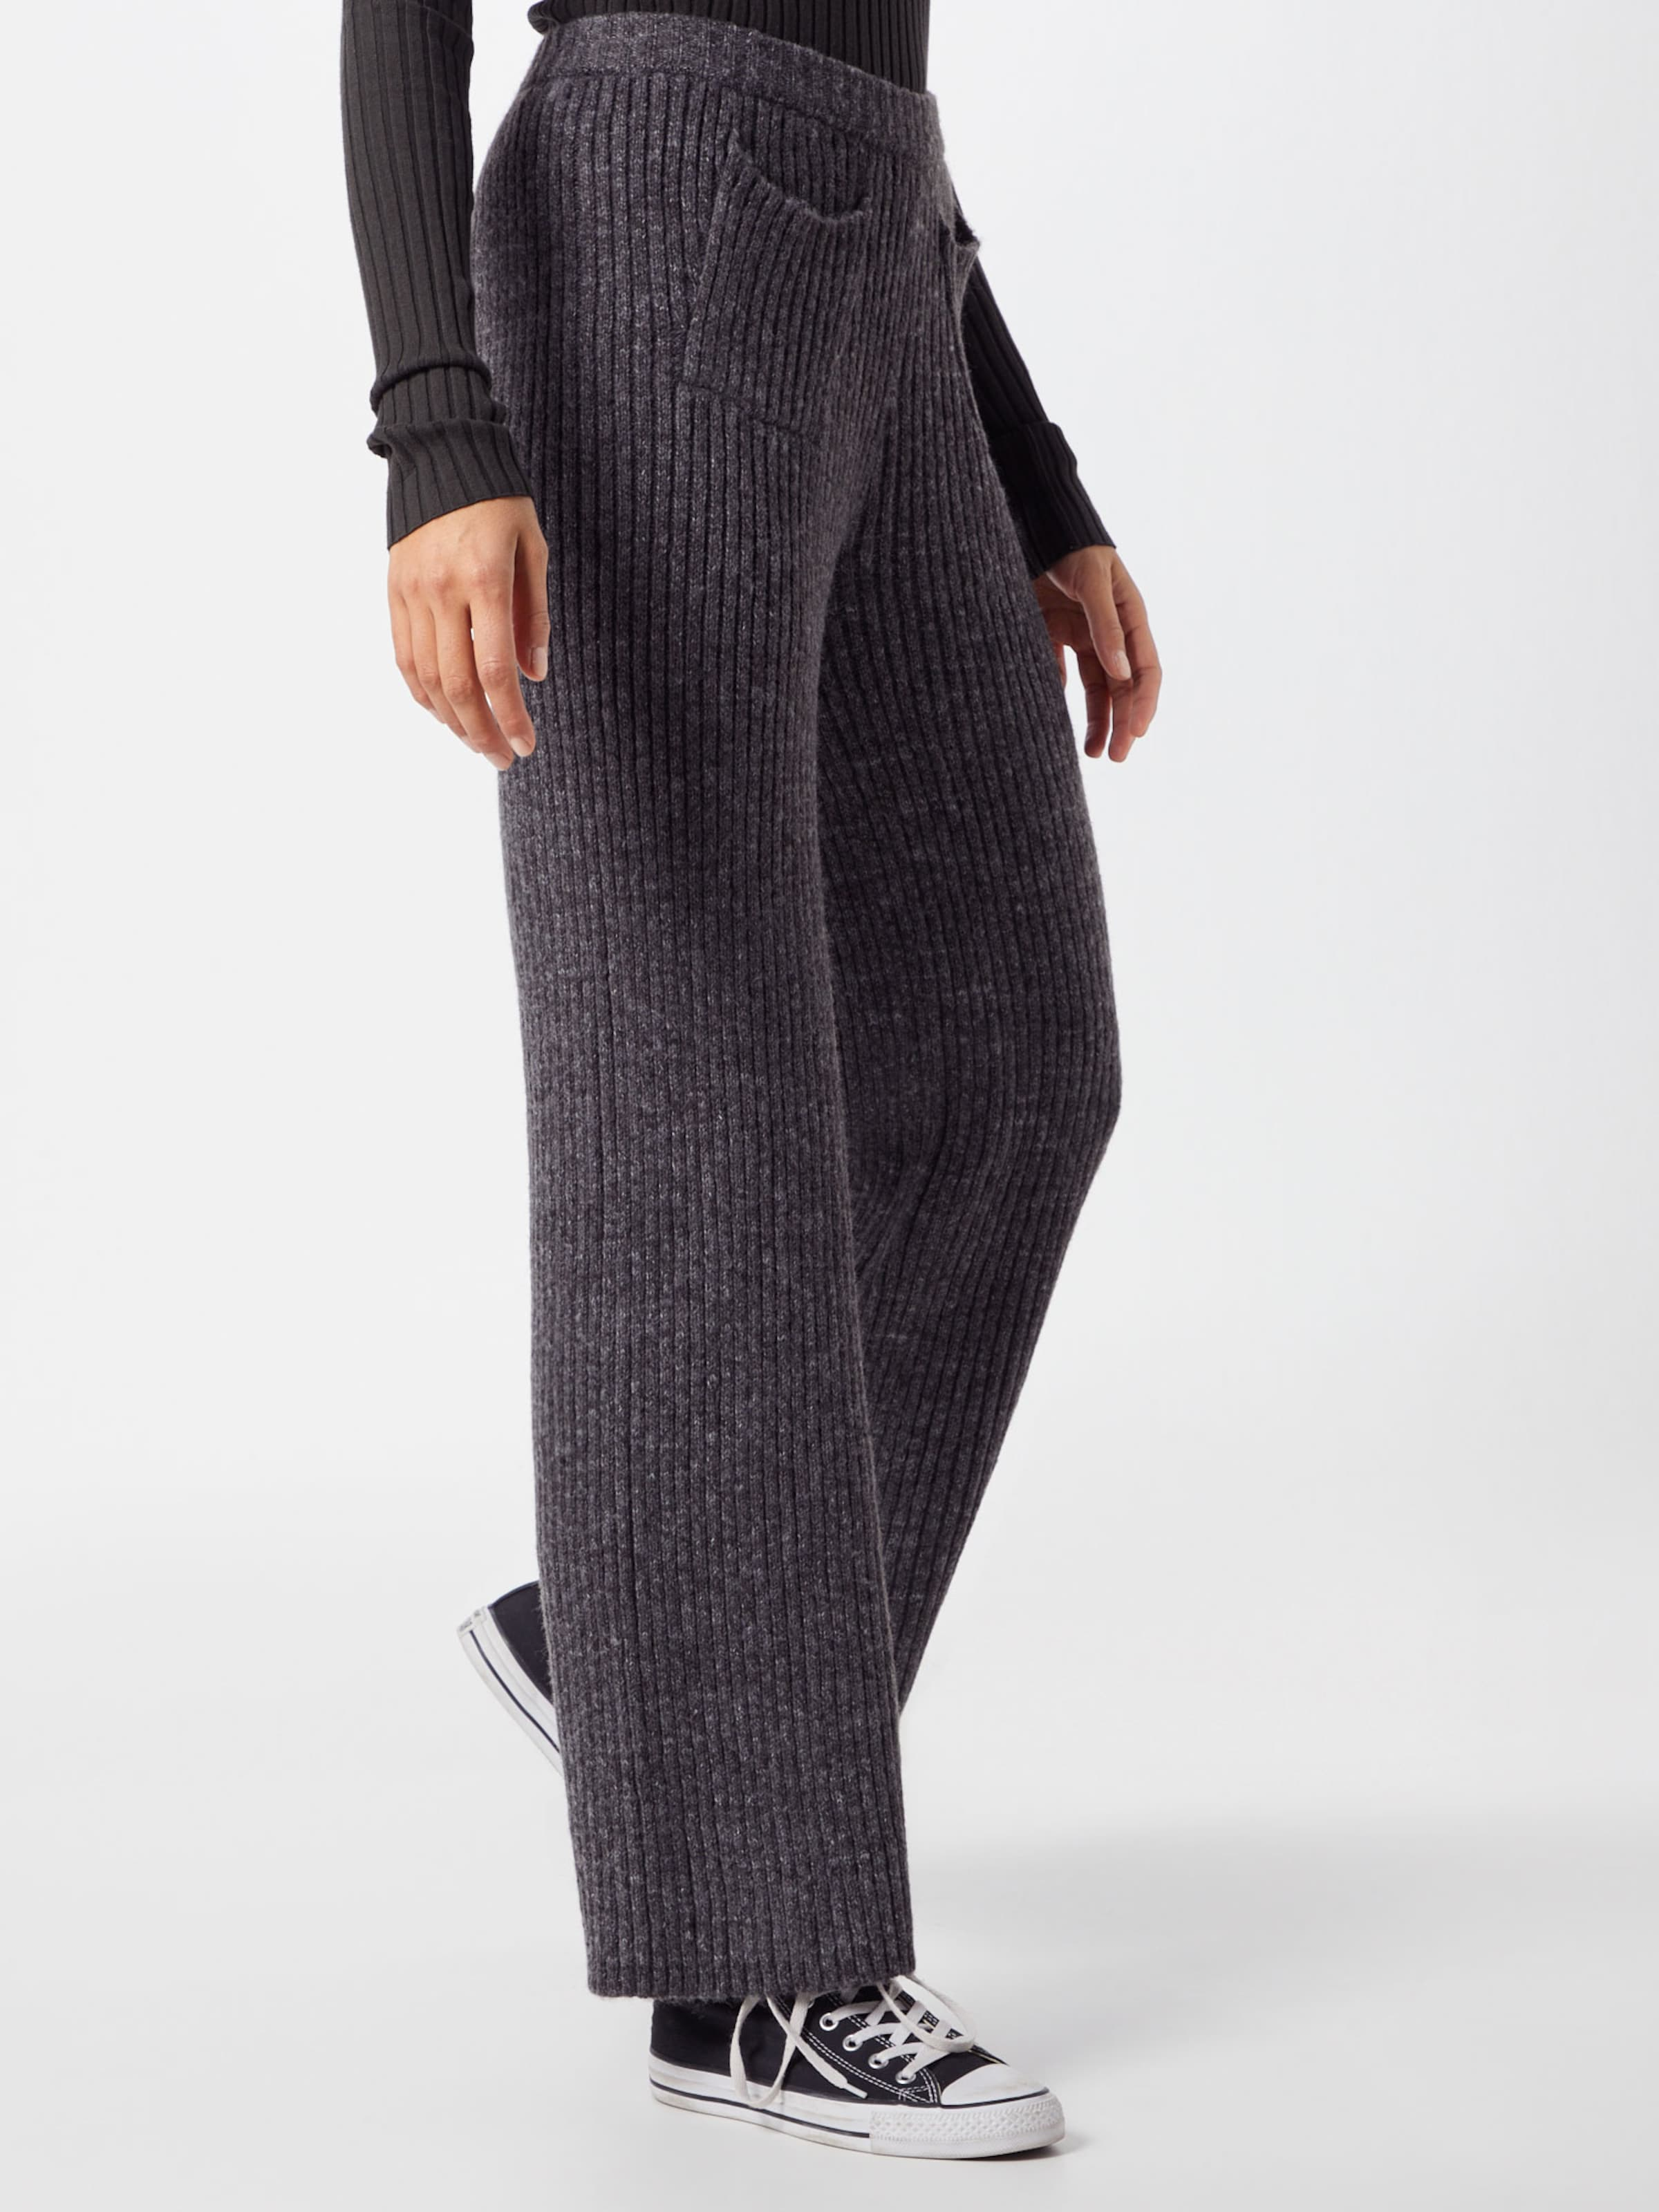 Grau 'palladium DamenHosen Youth Pant' Native In Knitted LqSMUzVGp